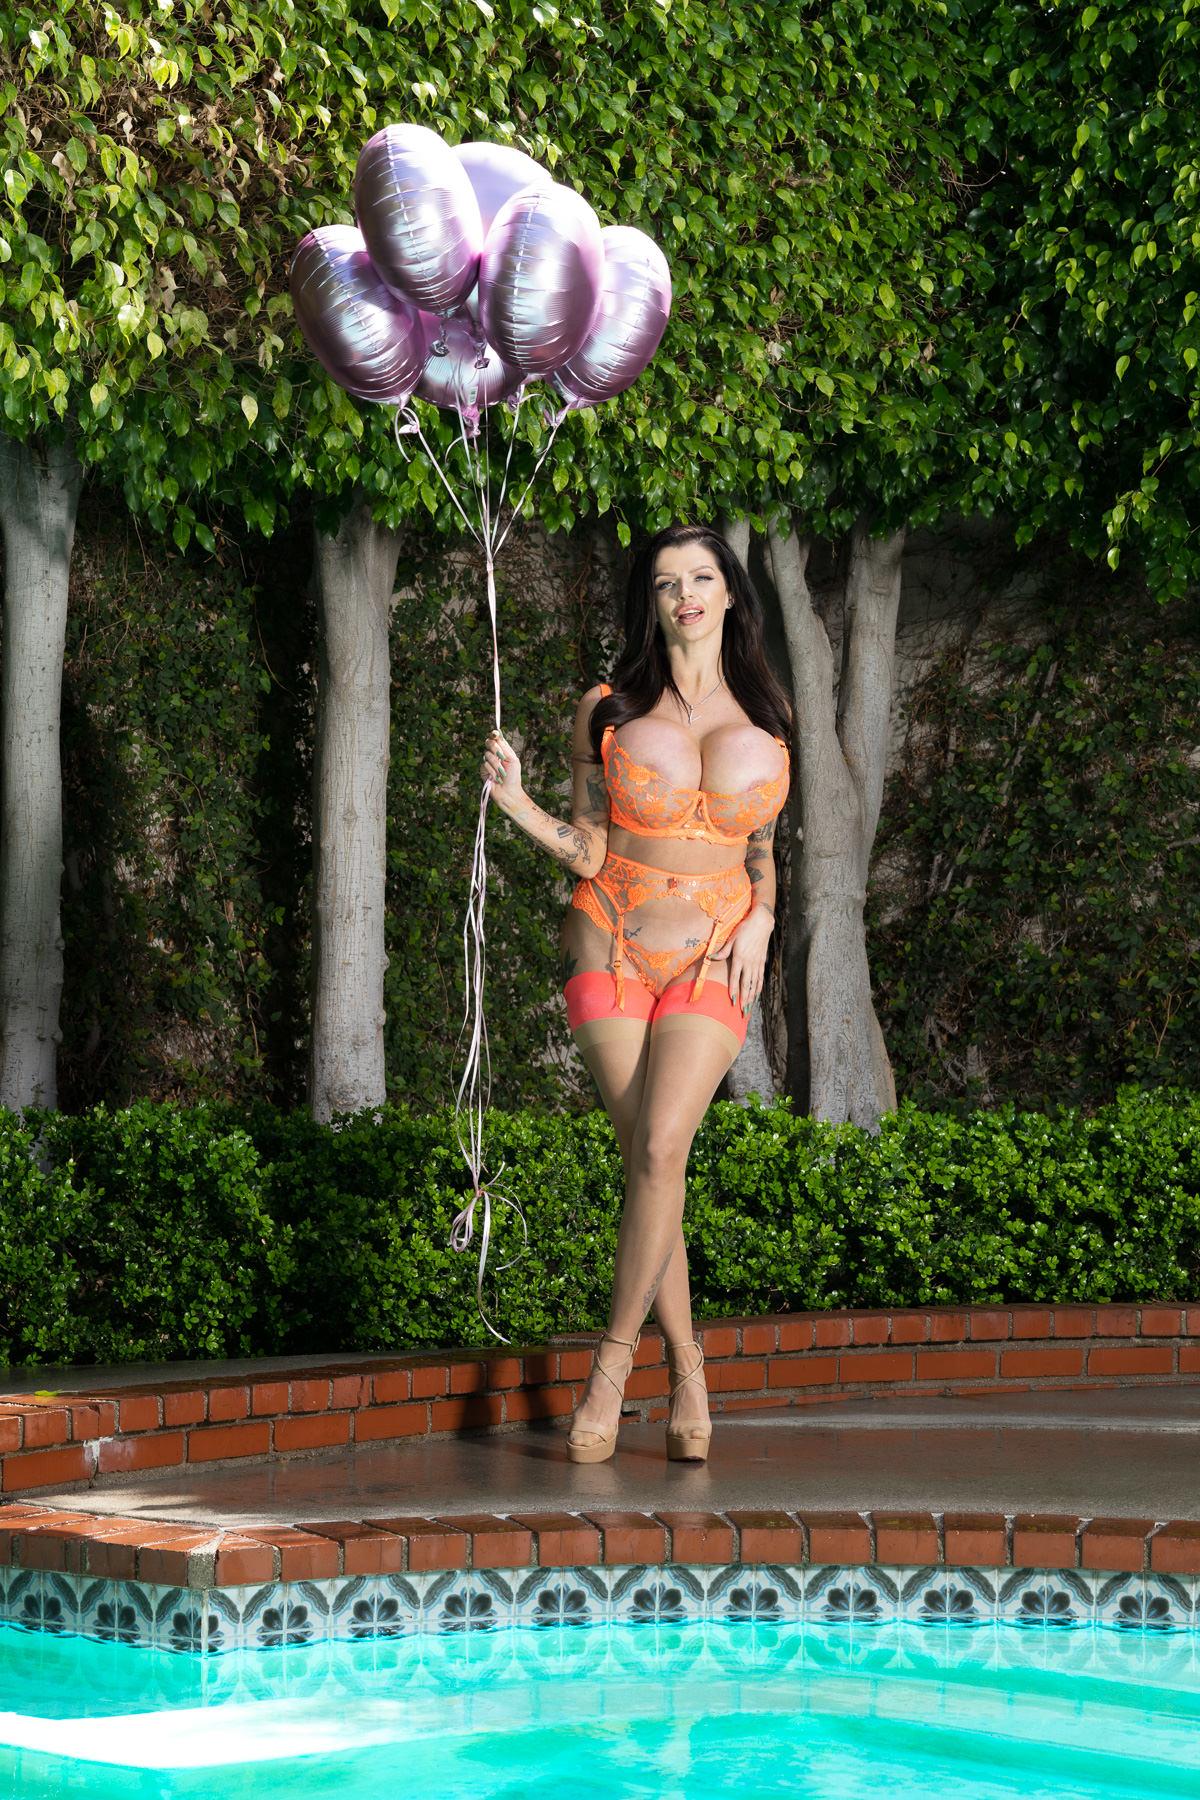 big boobs with balloons